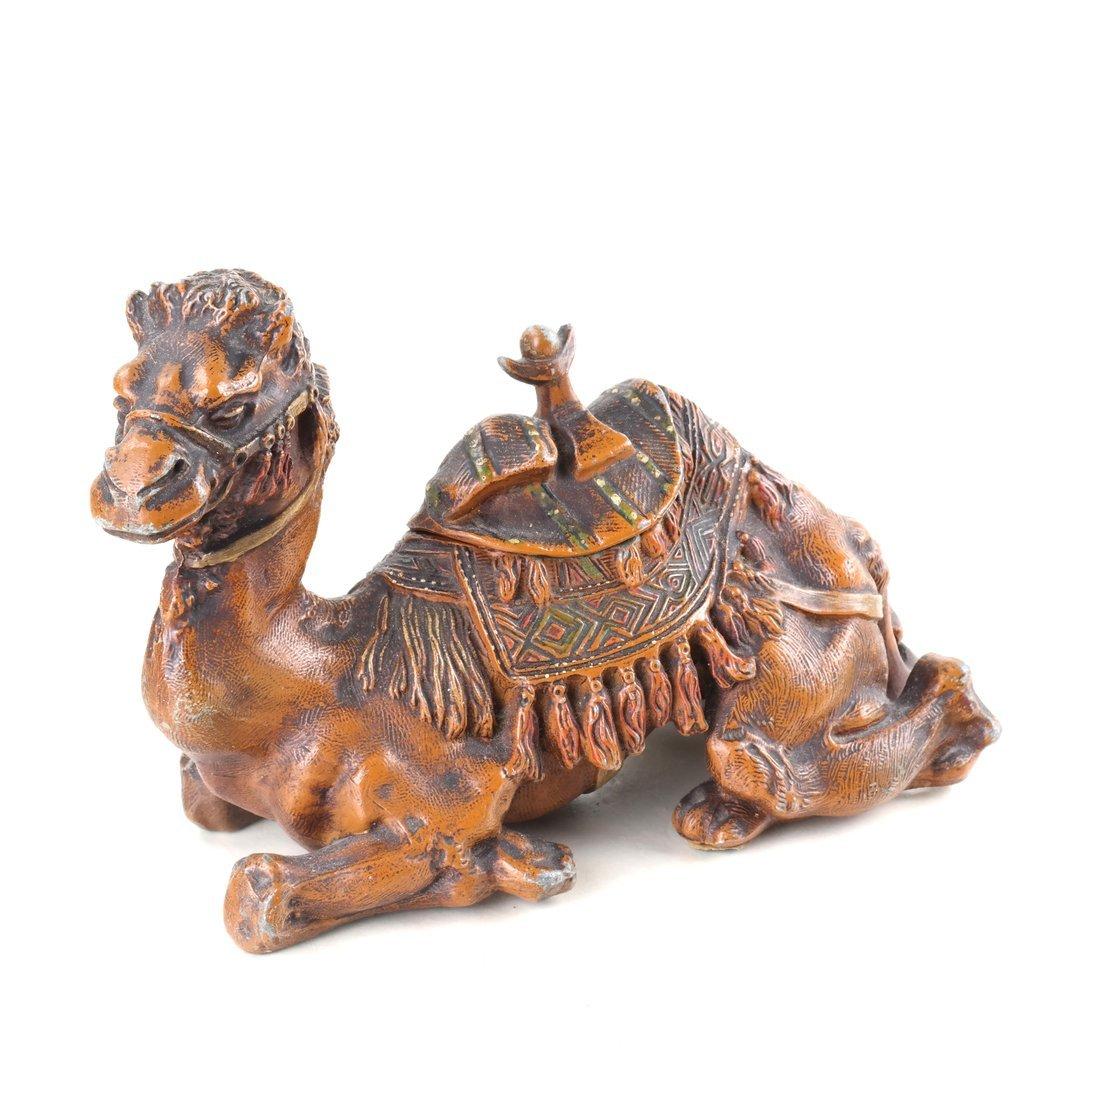 Seven Cast Metal Camel Figures - 6